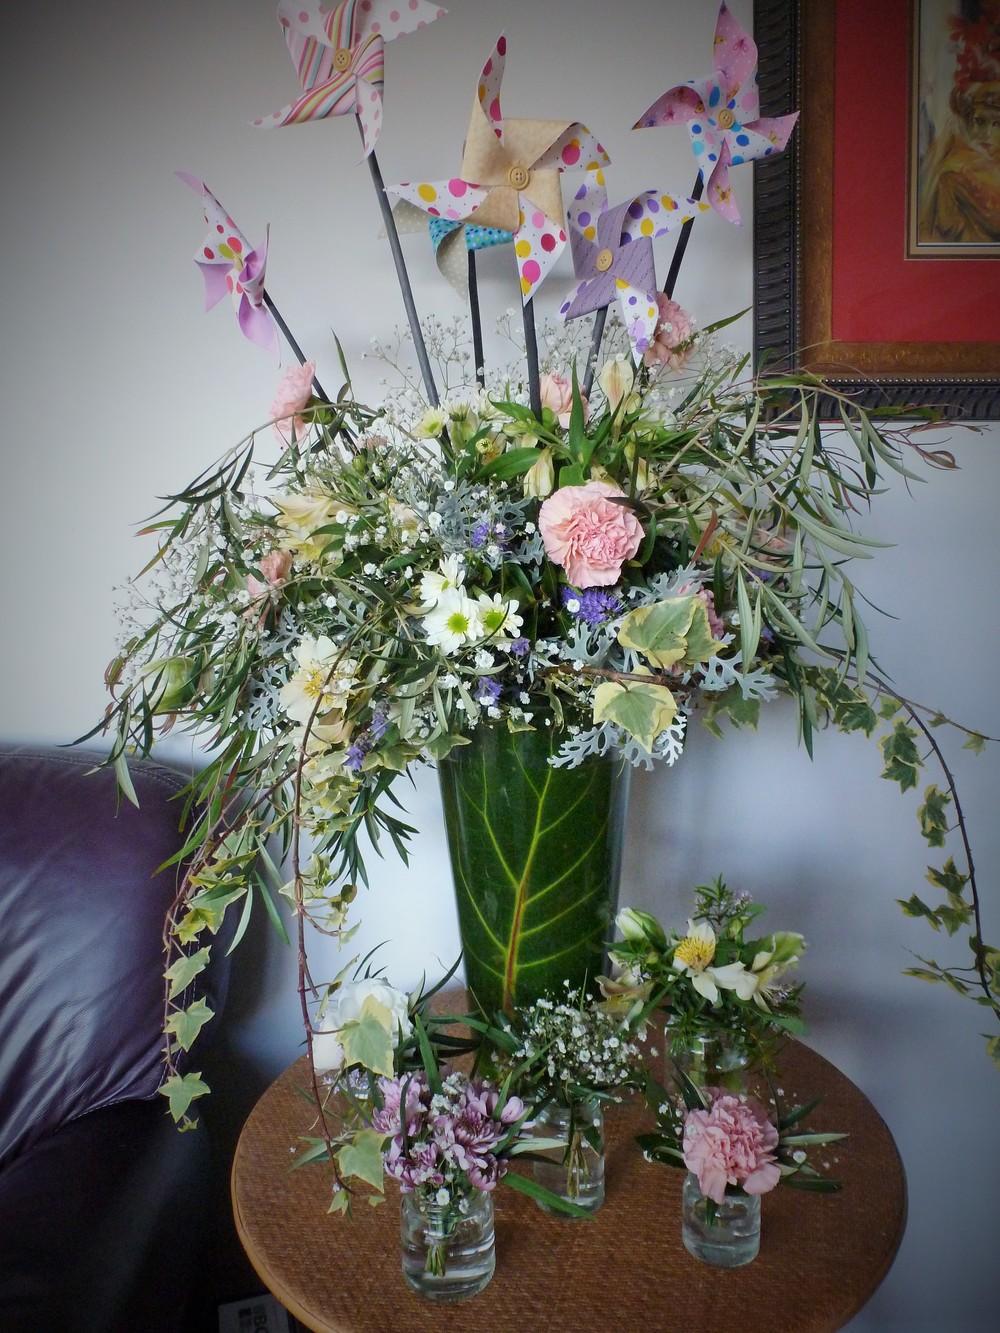 Whimsical arrangement